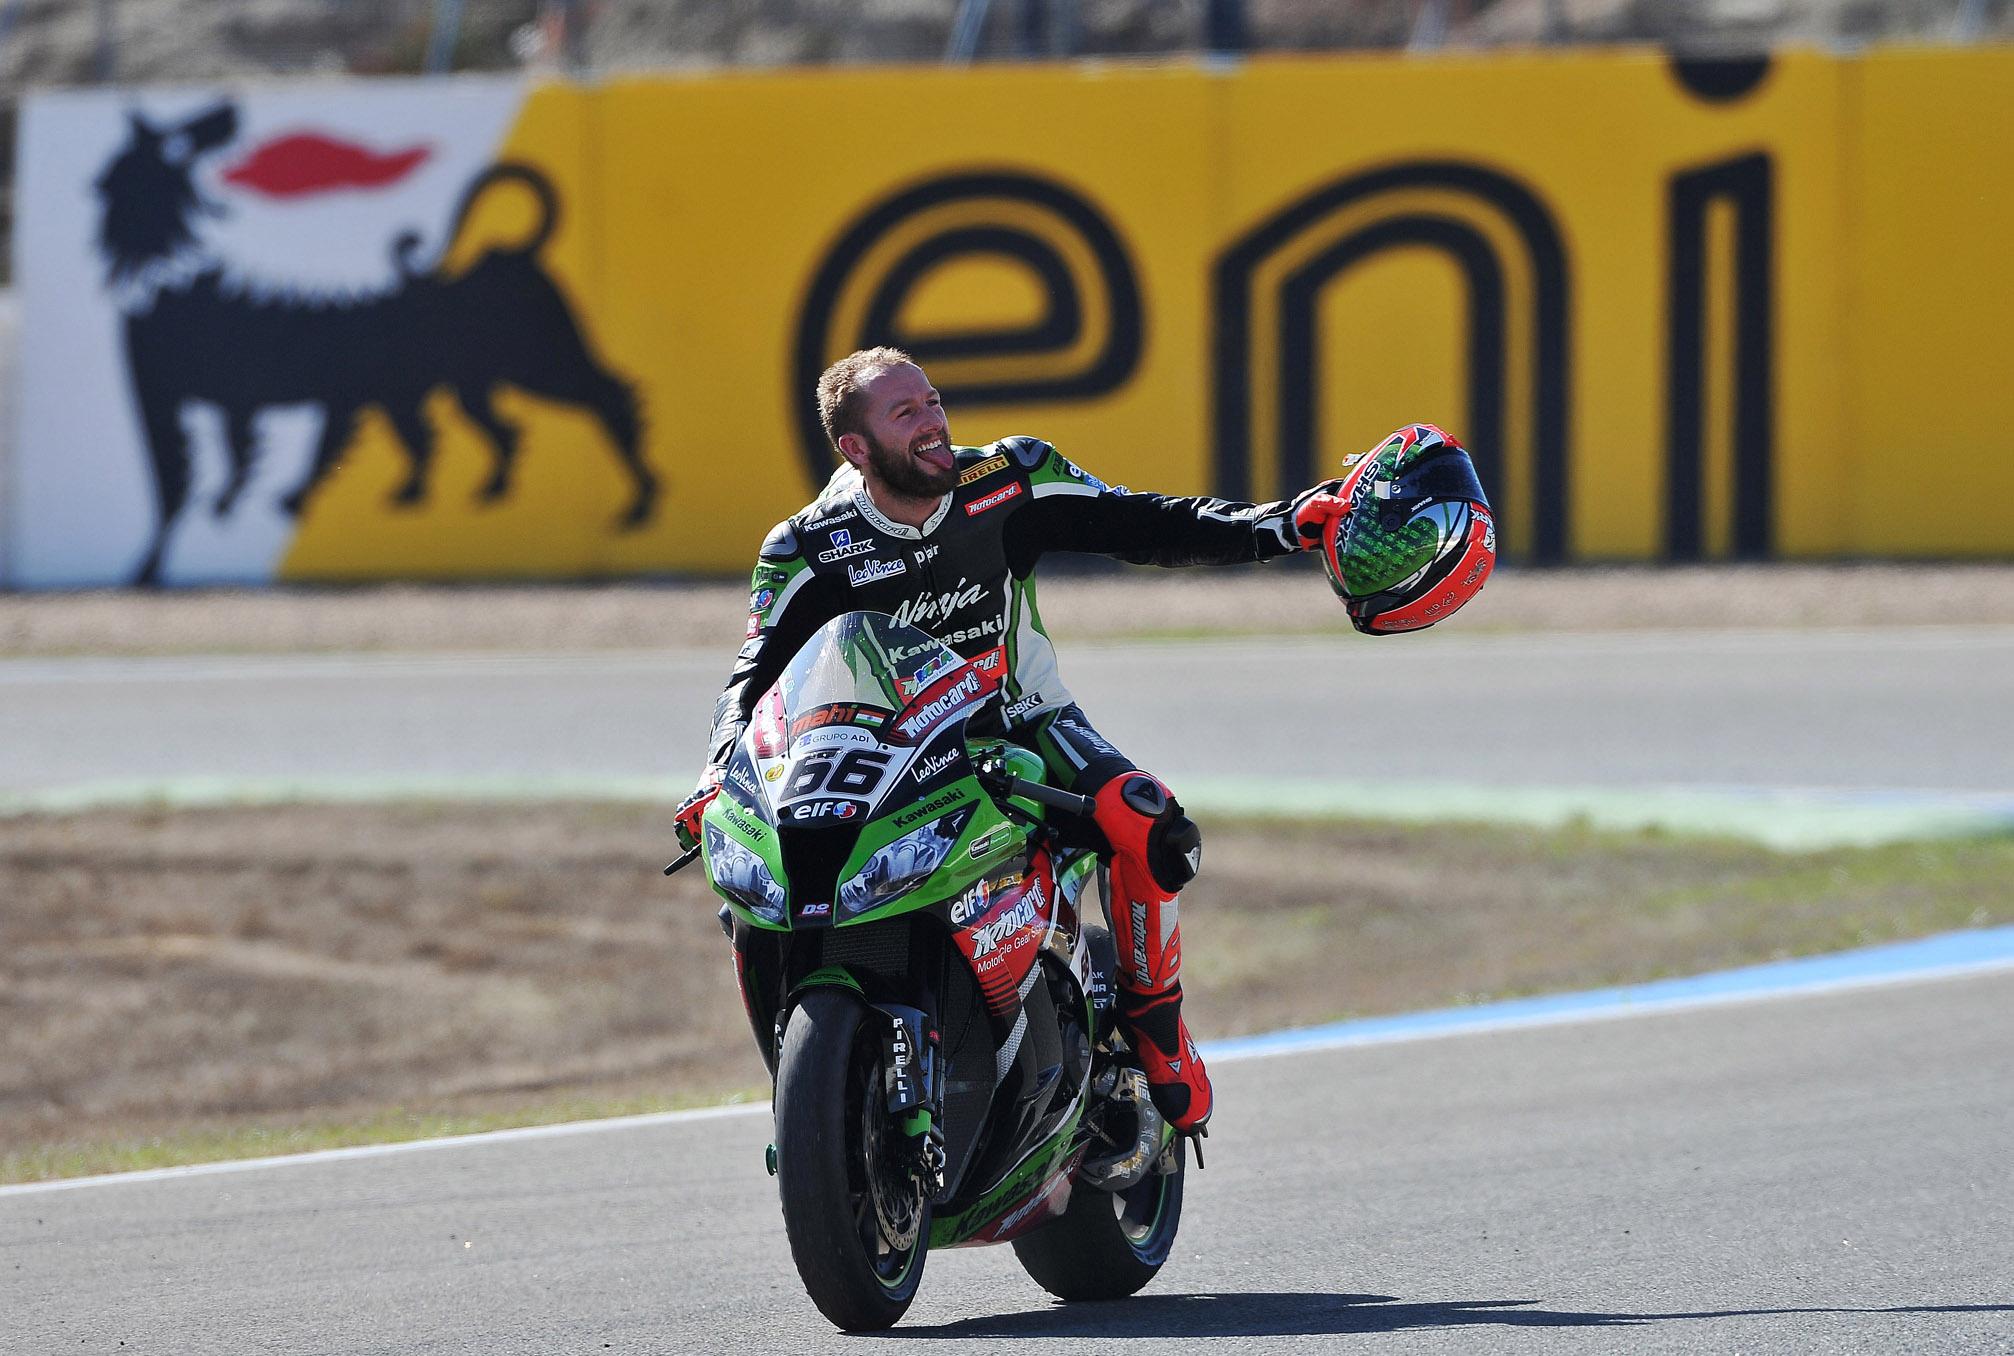 Sykes Campione Mondiale SBK 2013 finish a Jerez